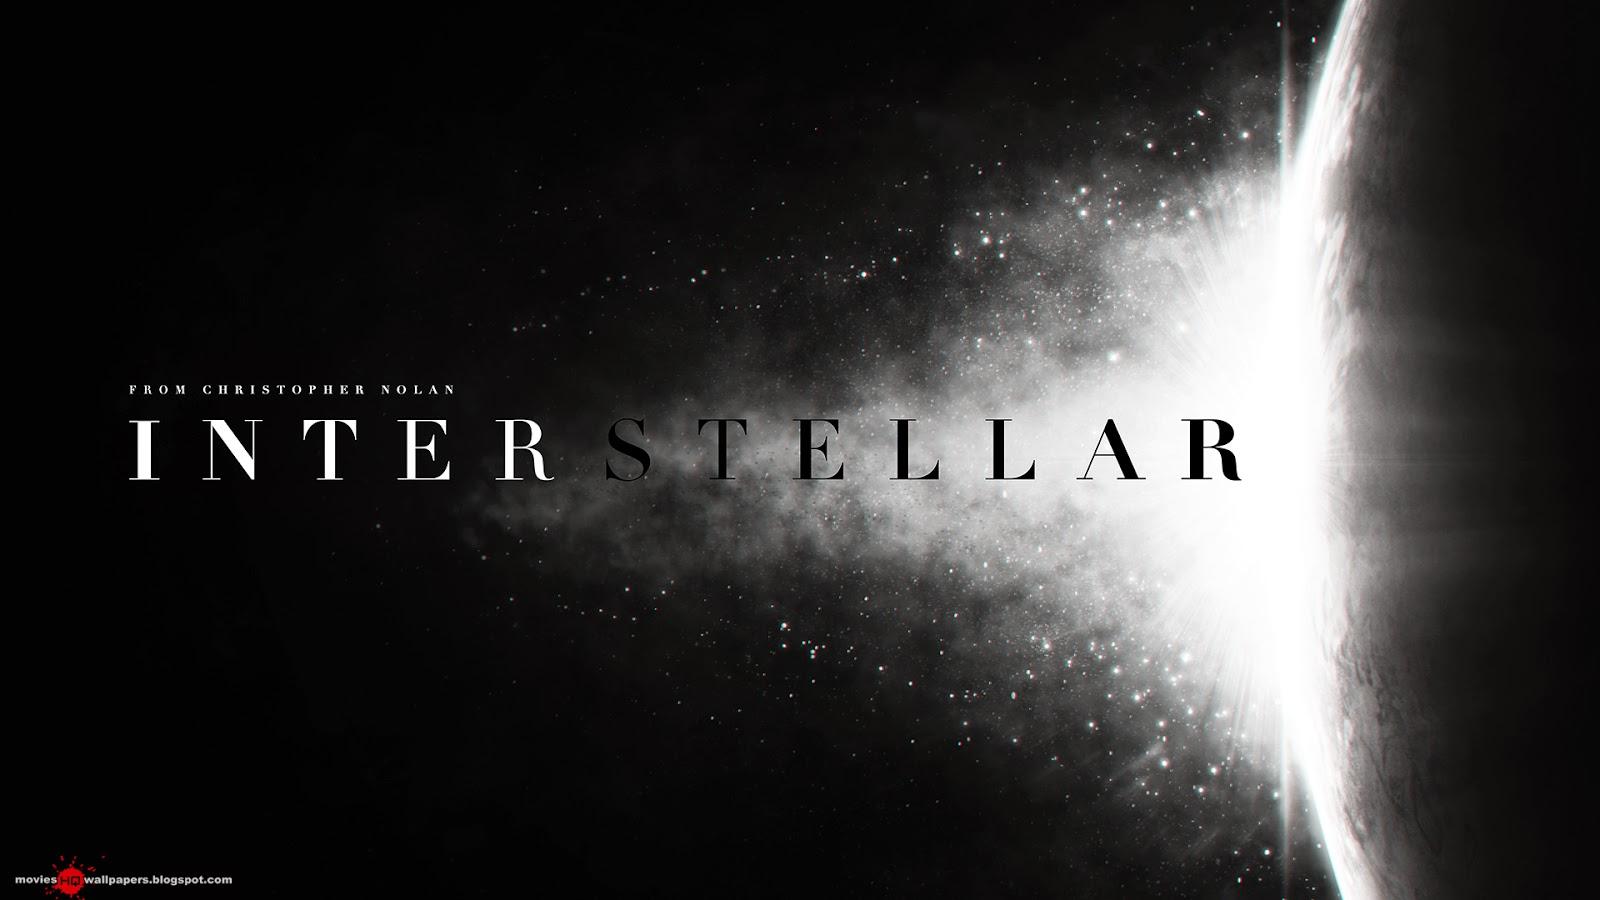 Interstellar movie wallpaper